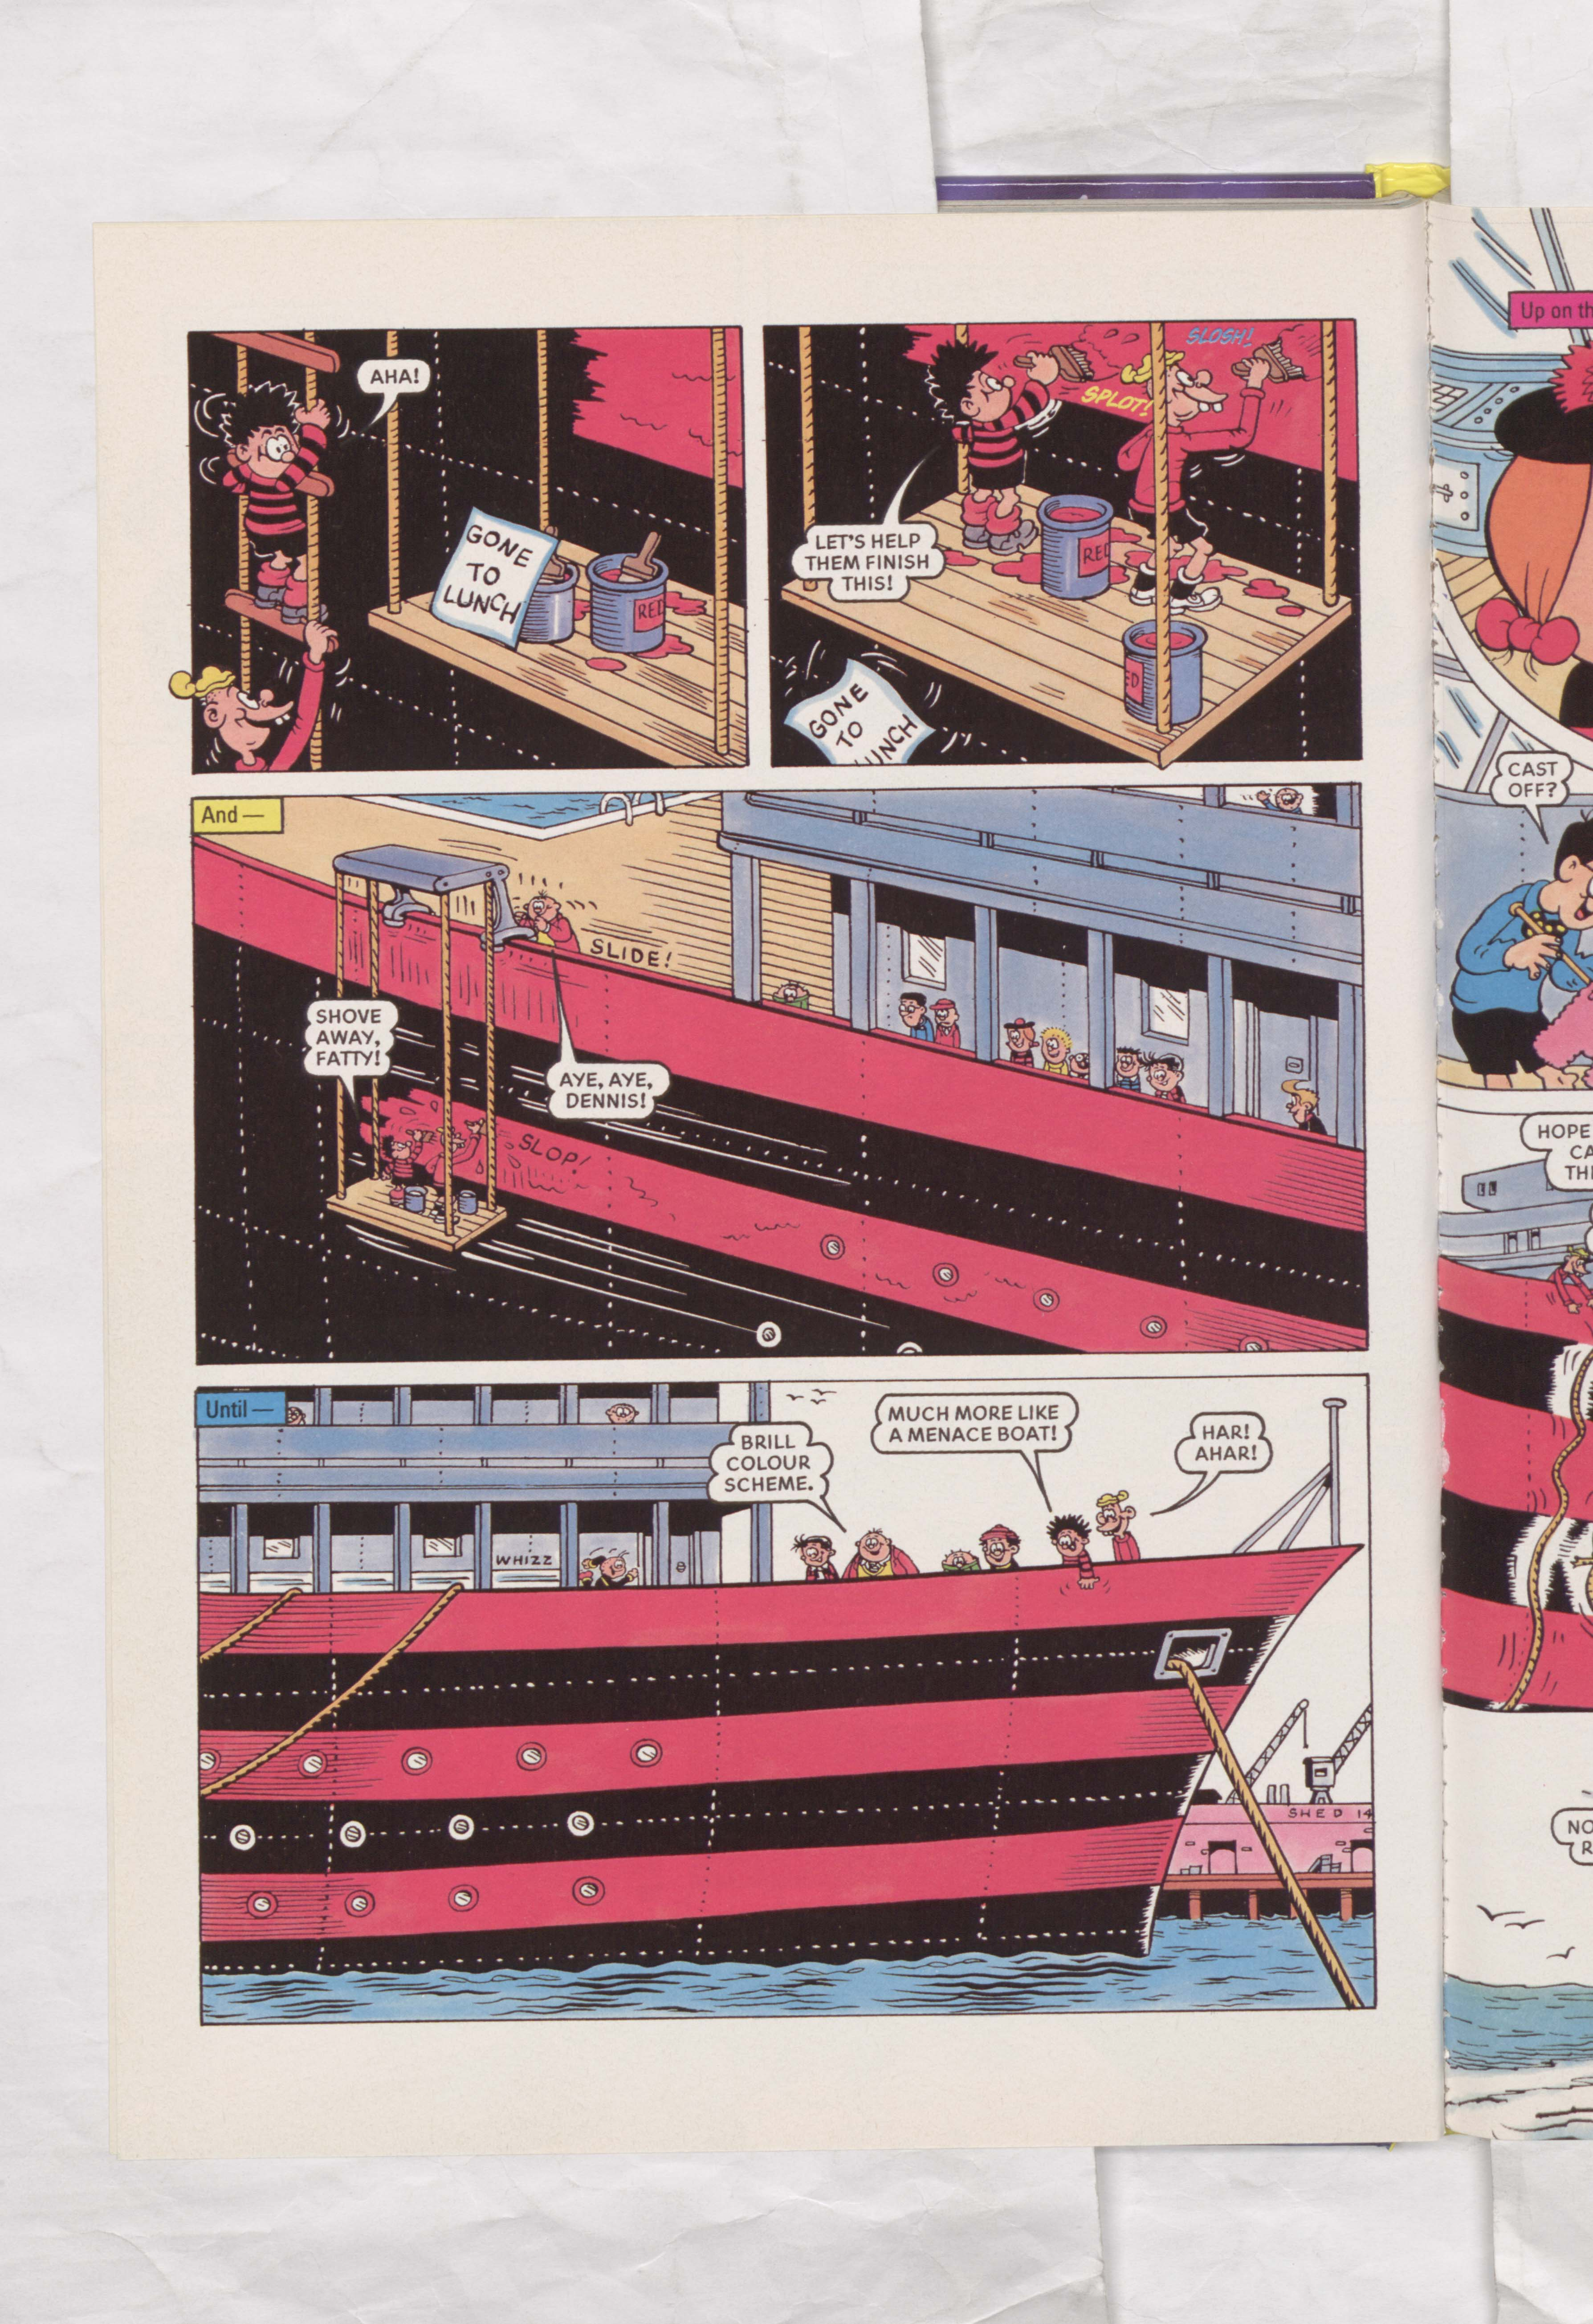 The Beano Stars Cruise Round the World - Beano Book 2000 Annual - Page 4